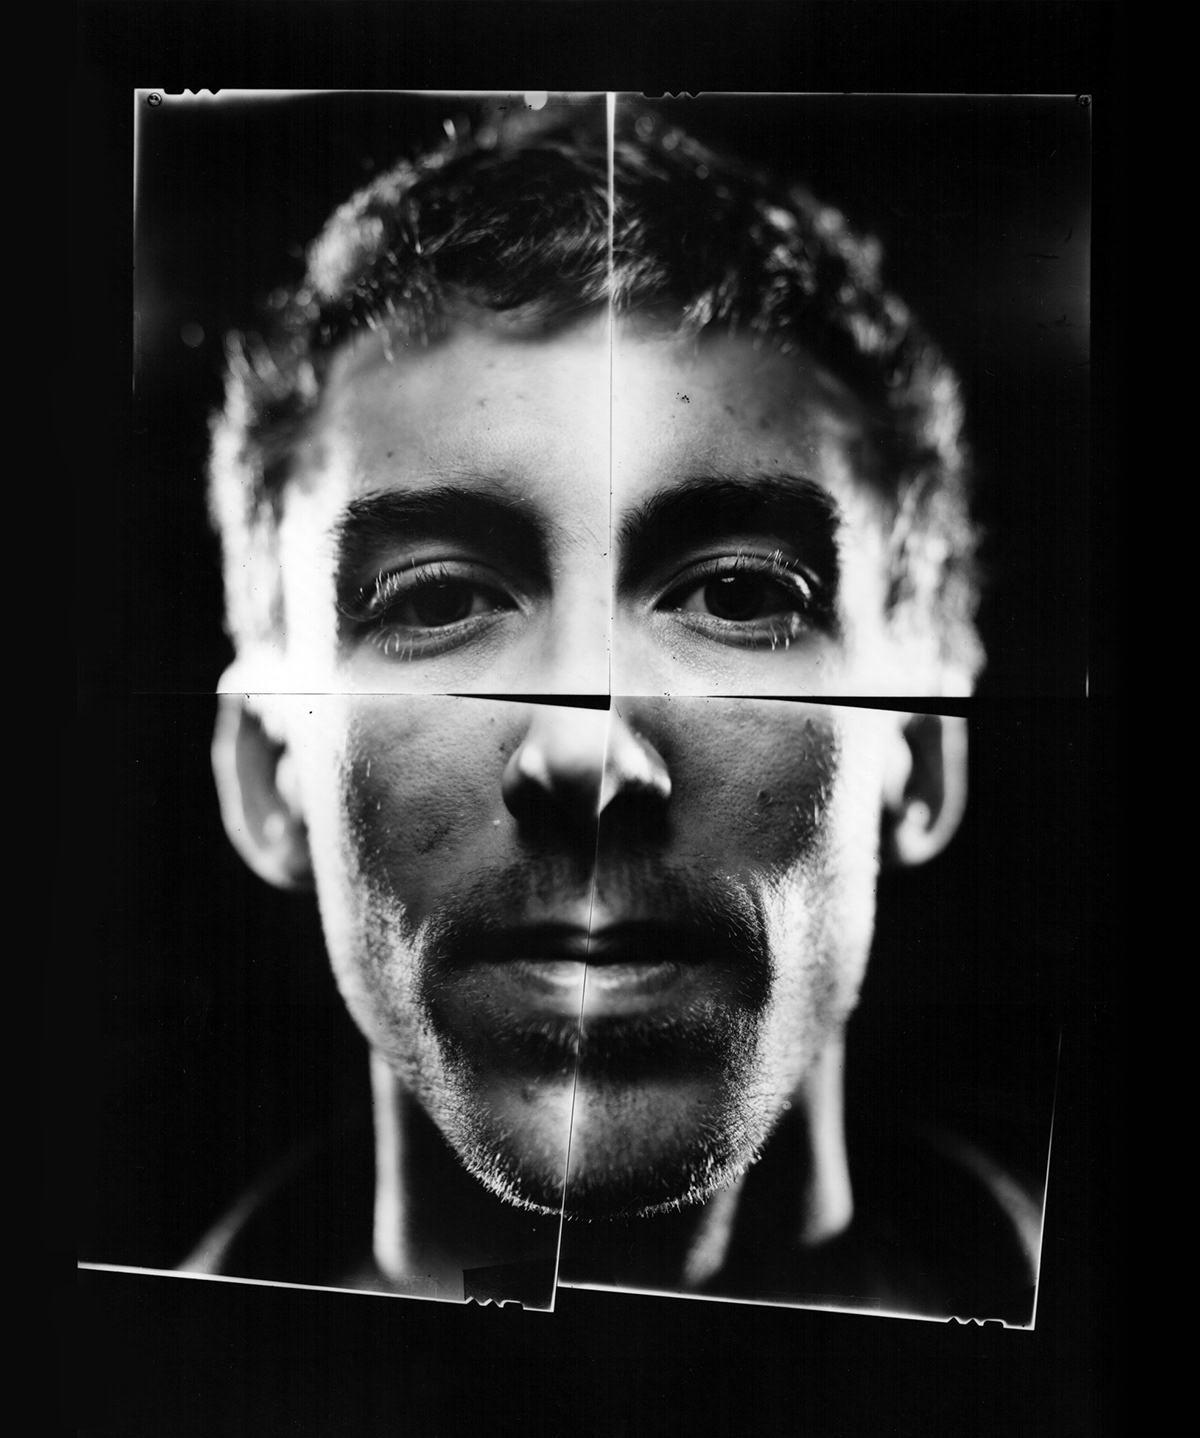 "Photography  portrait photography 4x5"" 8x10"" large format film"